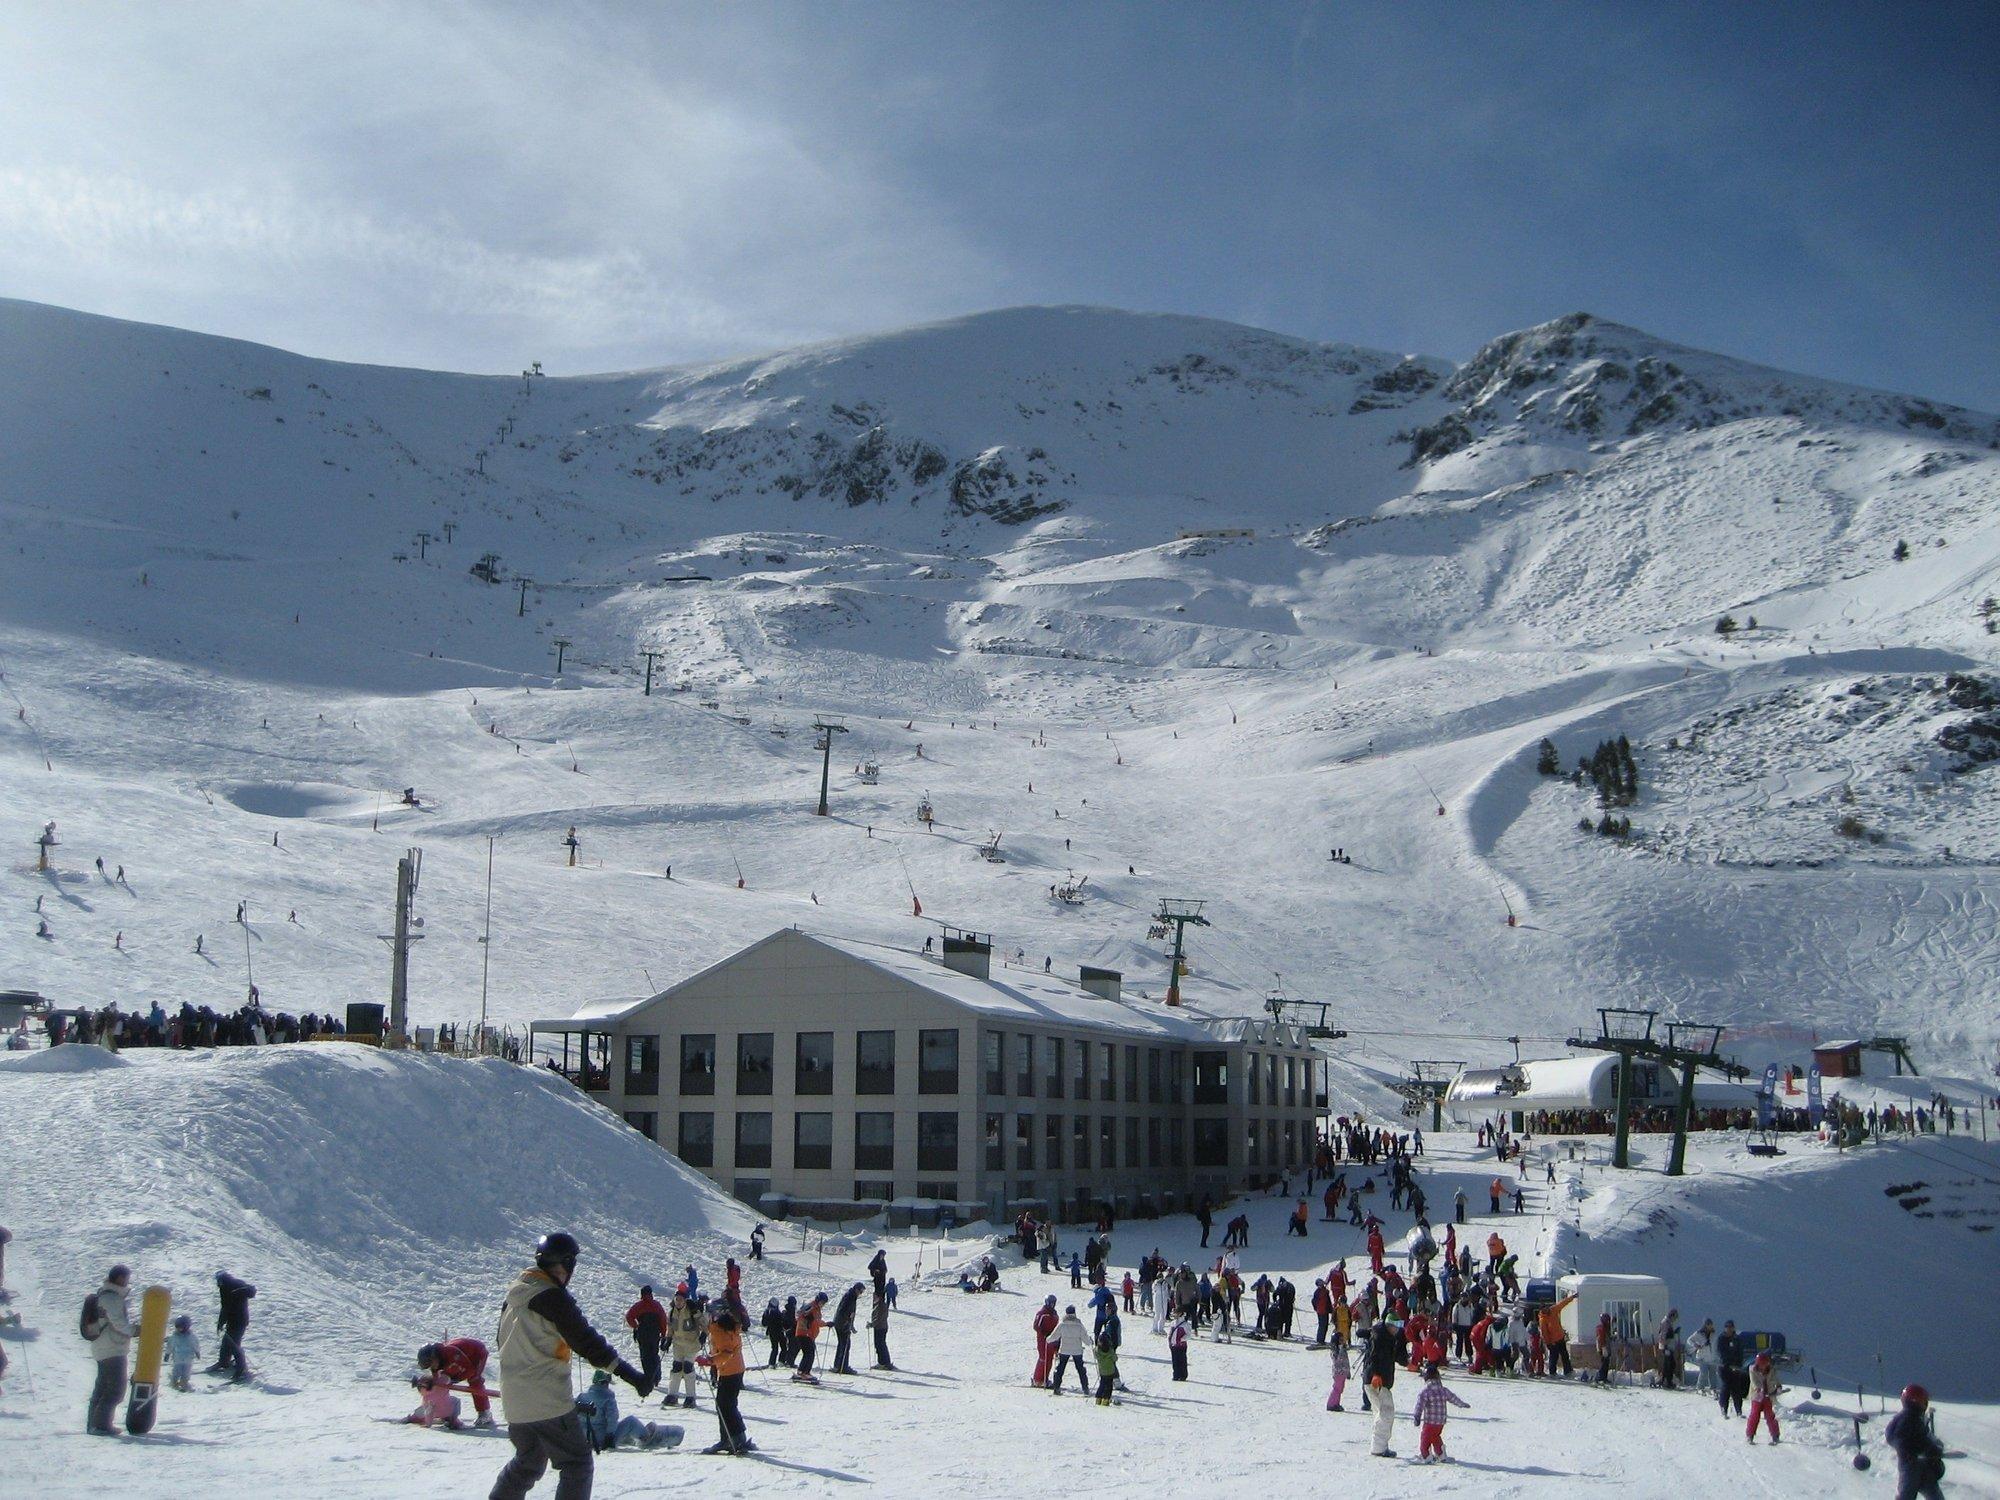 Valdezcaray prevé abrir este martes veintidós pistas de esquí con calidad de nieve polvo